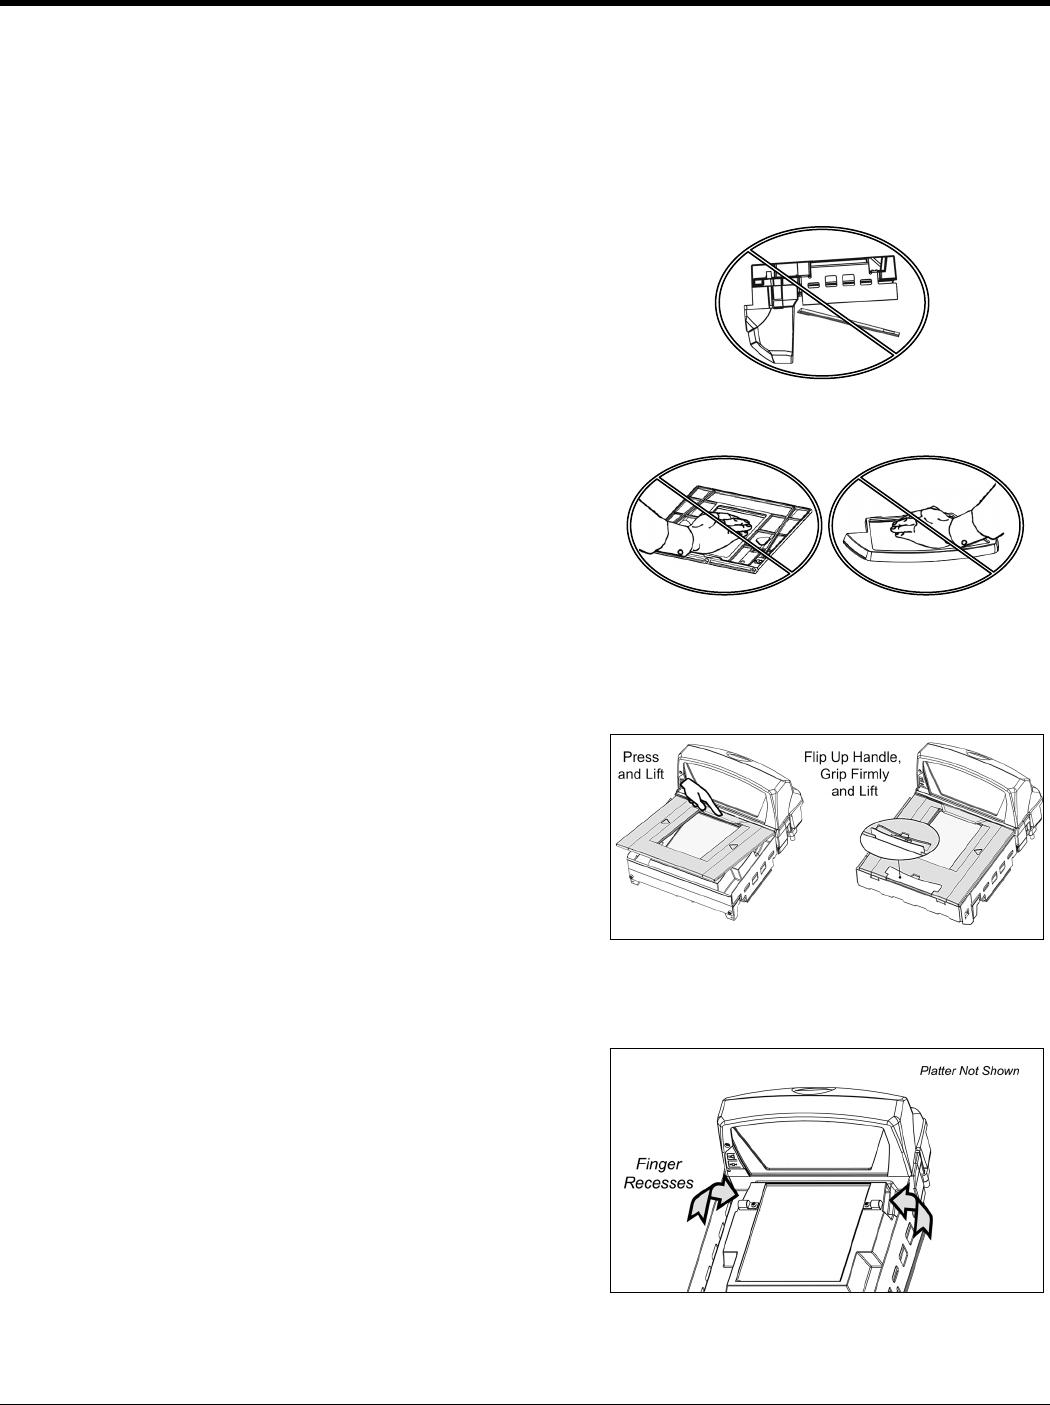 honeywell ms2421 ms2422 ms2431 bar code scanner installation and 24V Transformer Wiring Diagram 4